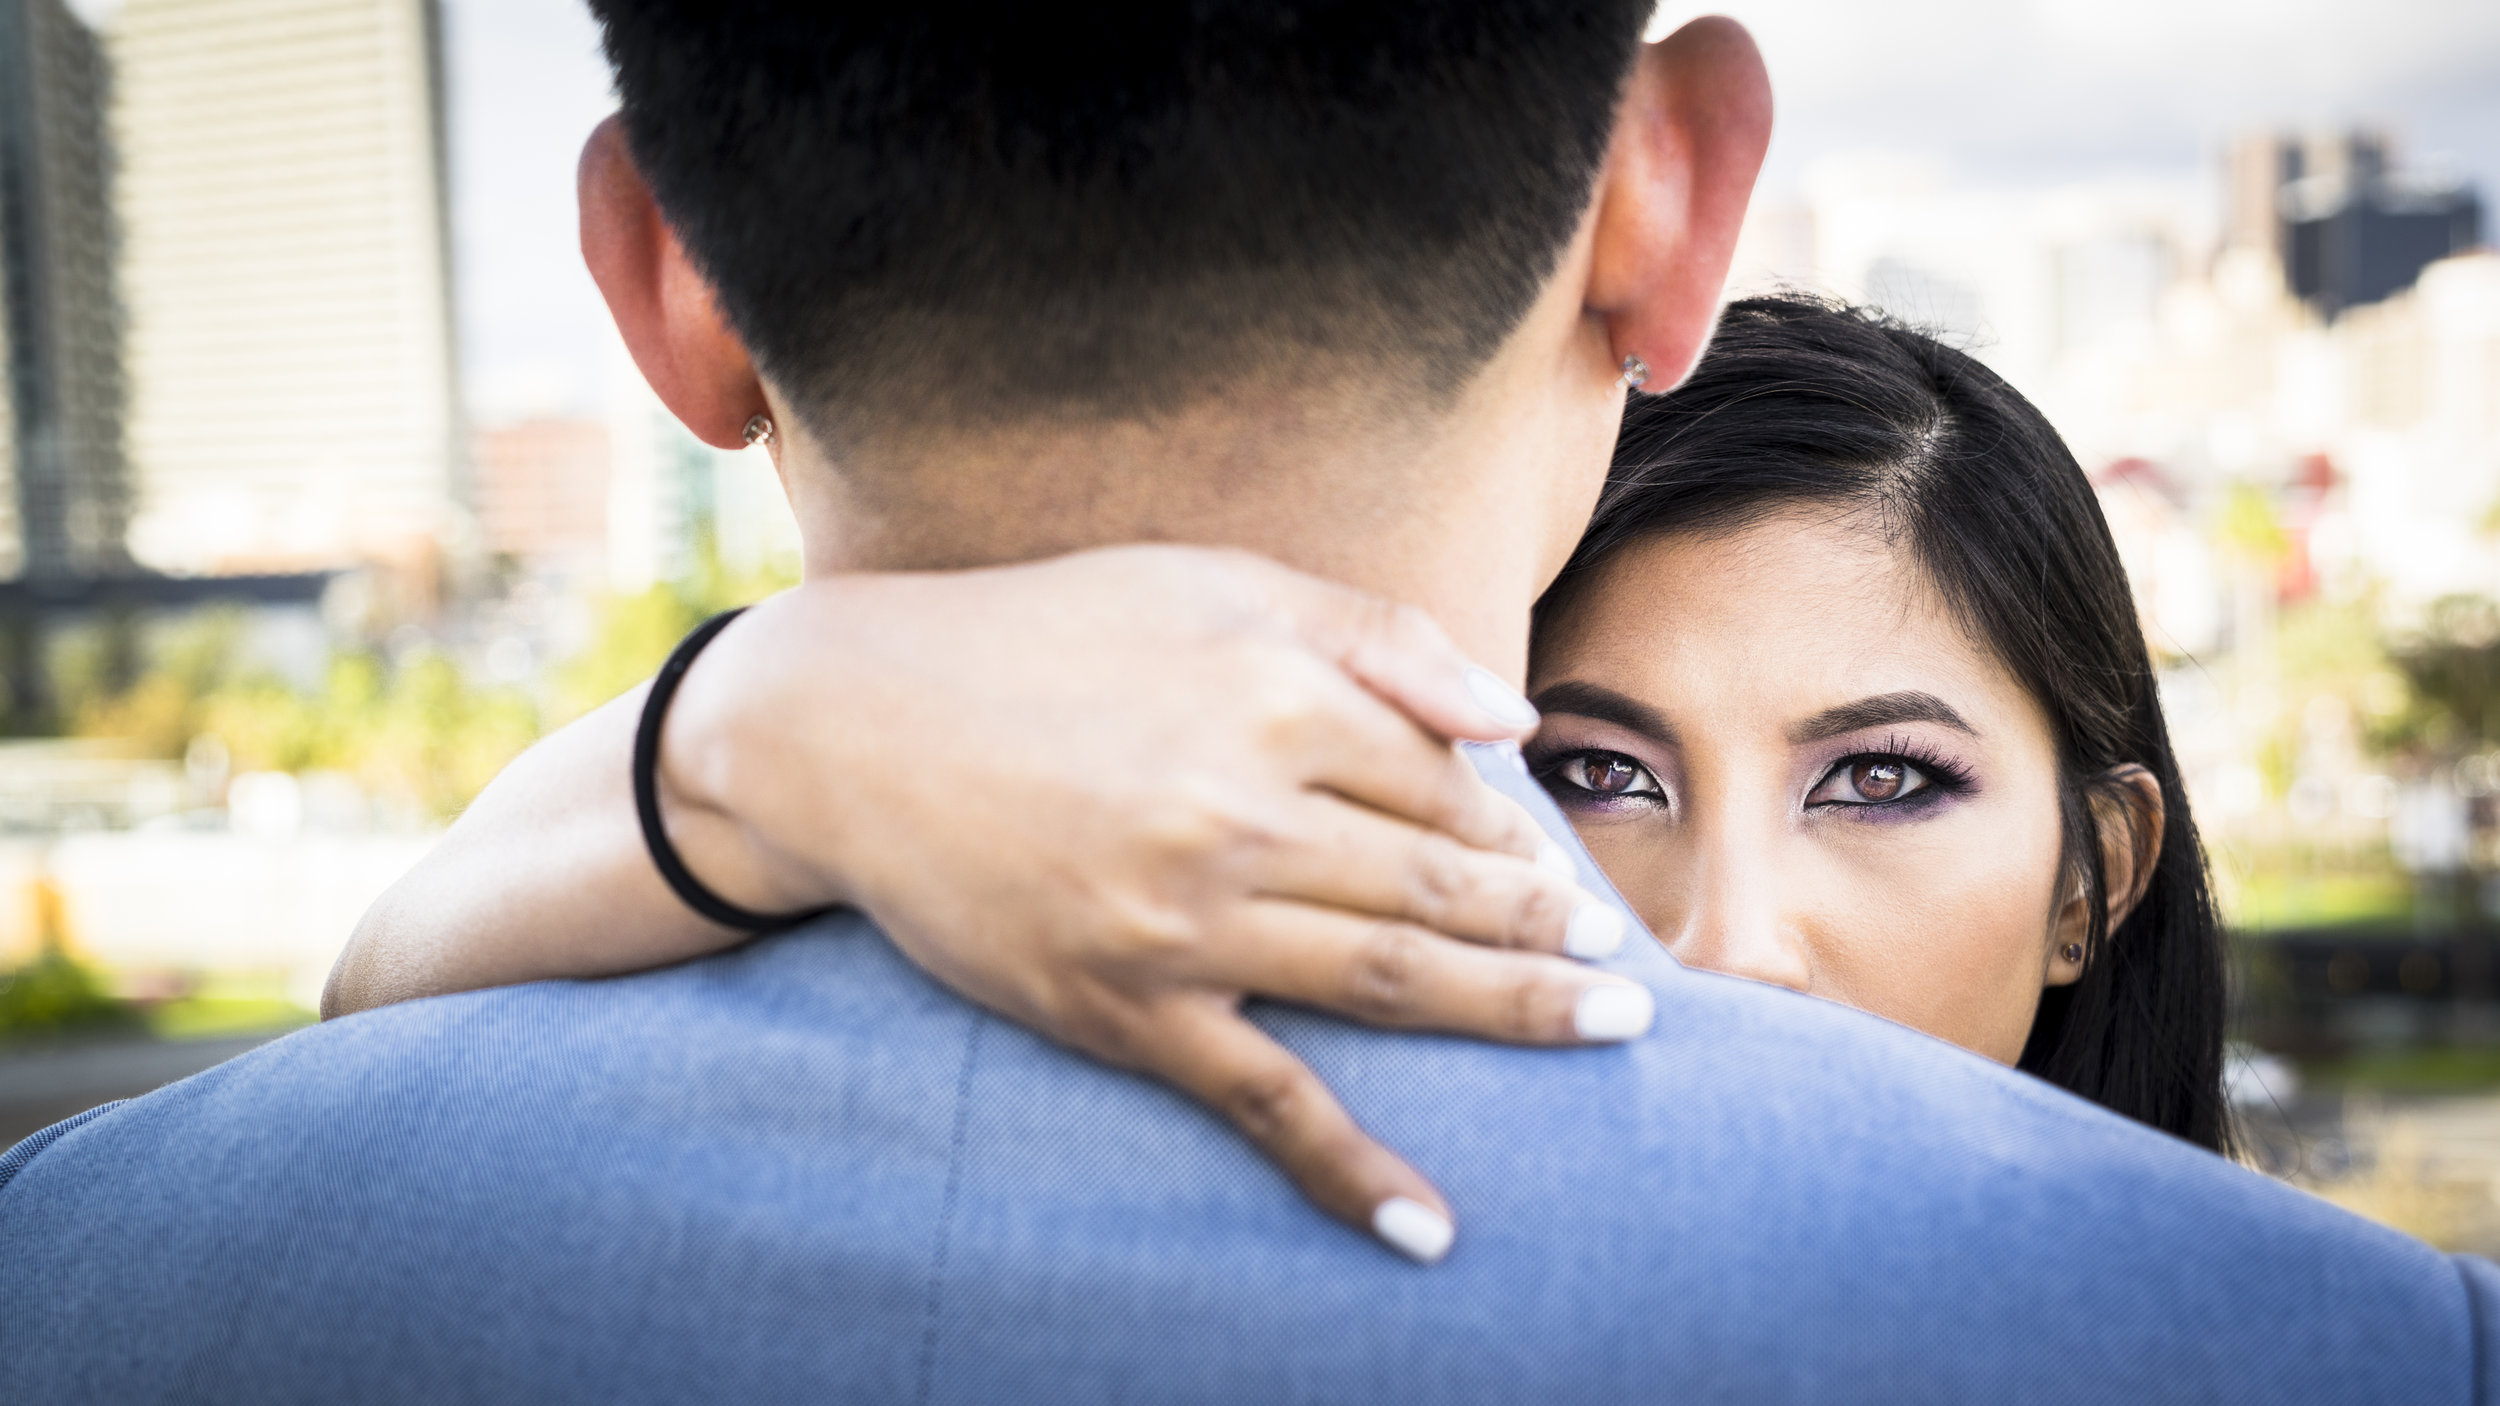 Desiree & Joey Pugeda Engagement Photos (03.01.2015)_23.1.jpg